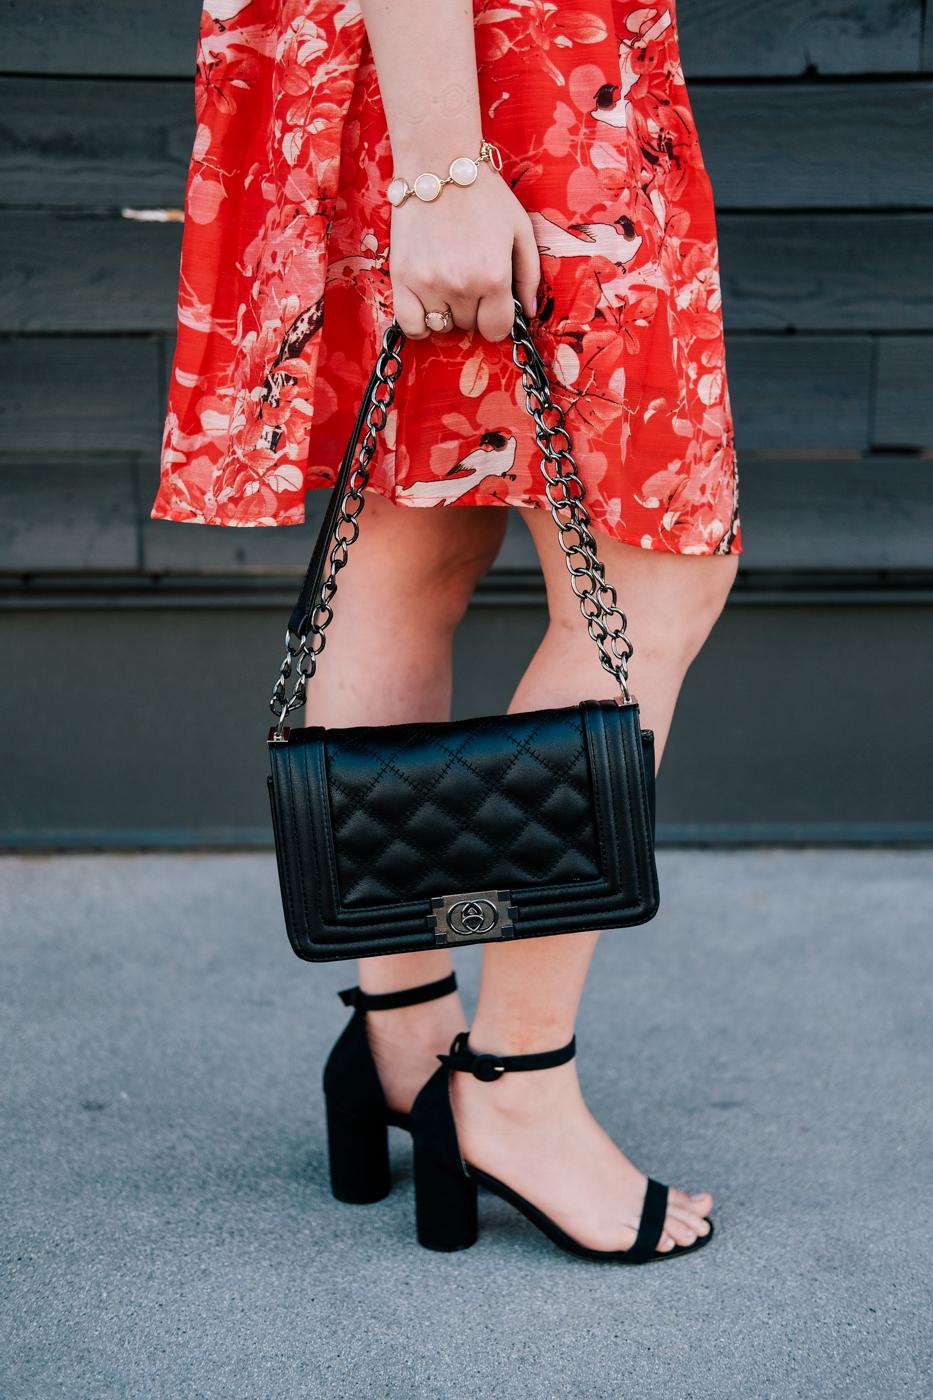 Debora Dahl, black heels and bag